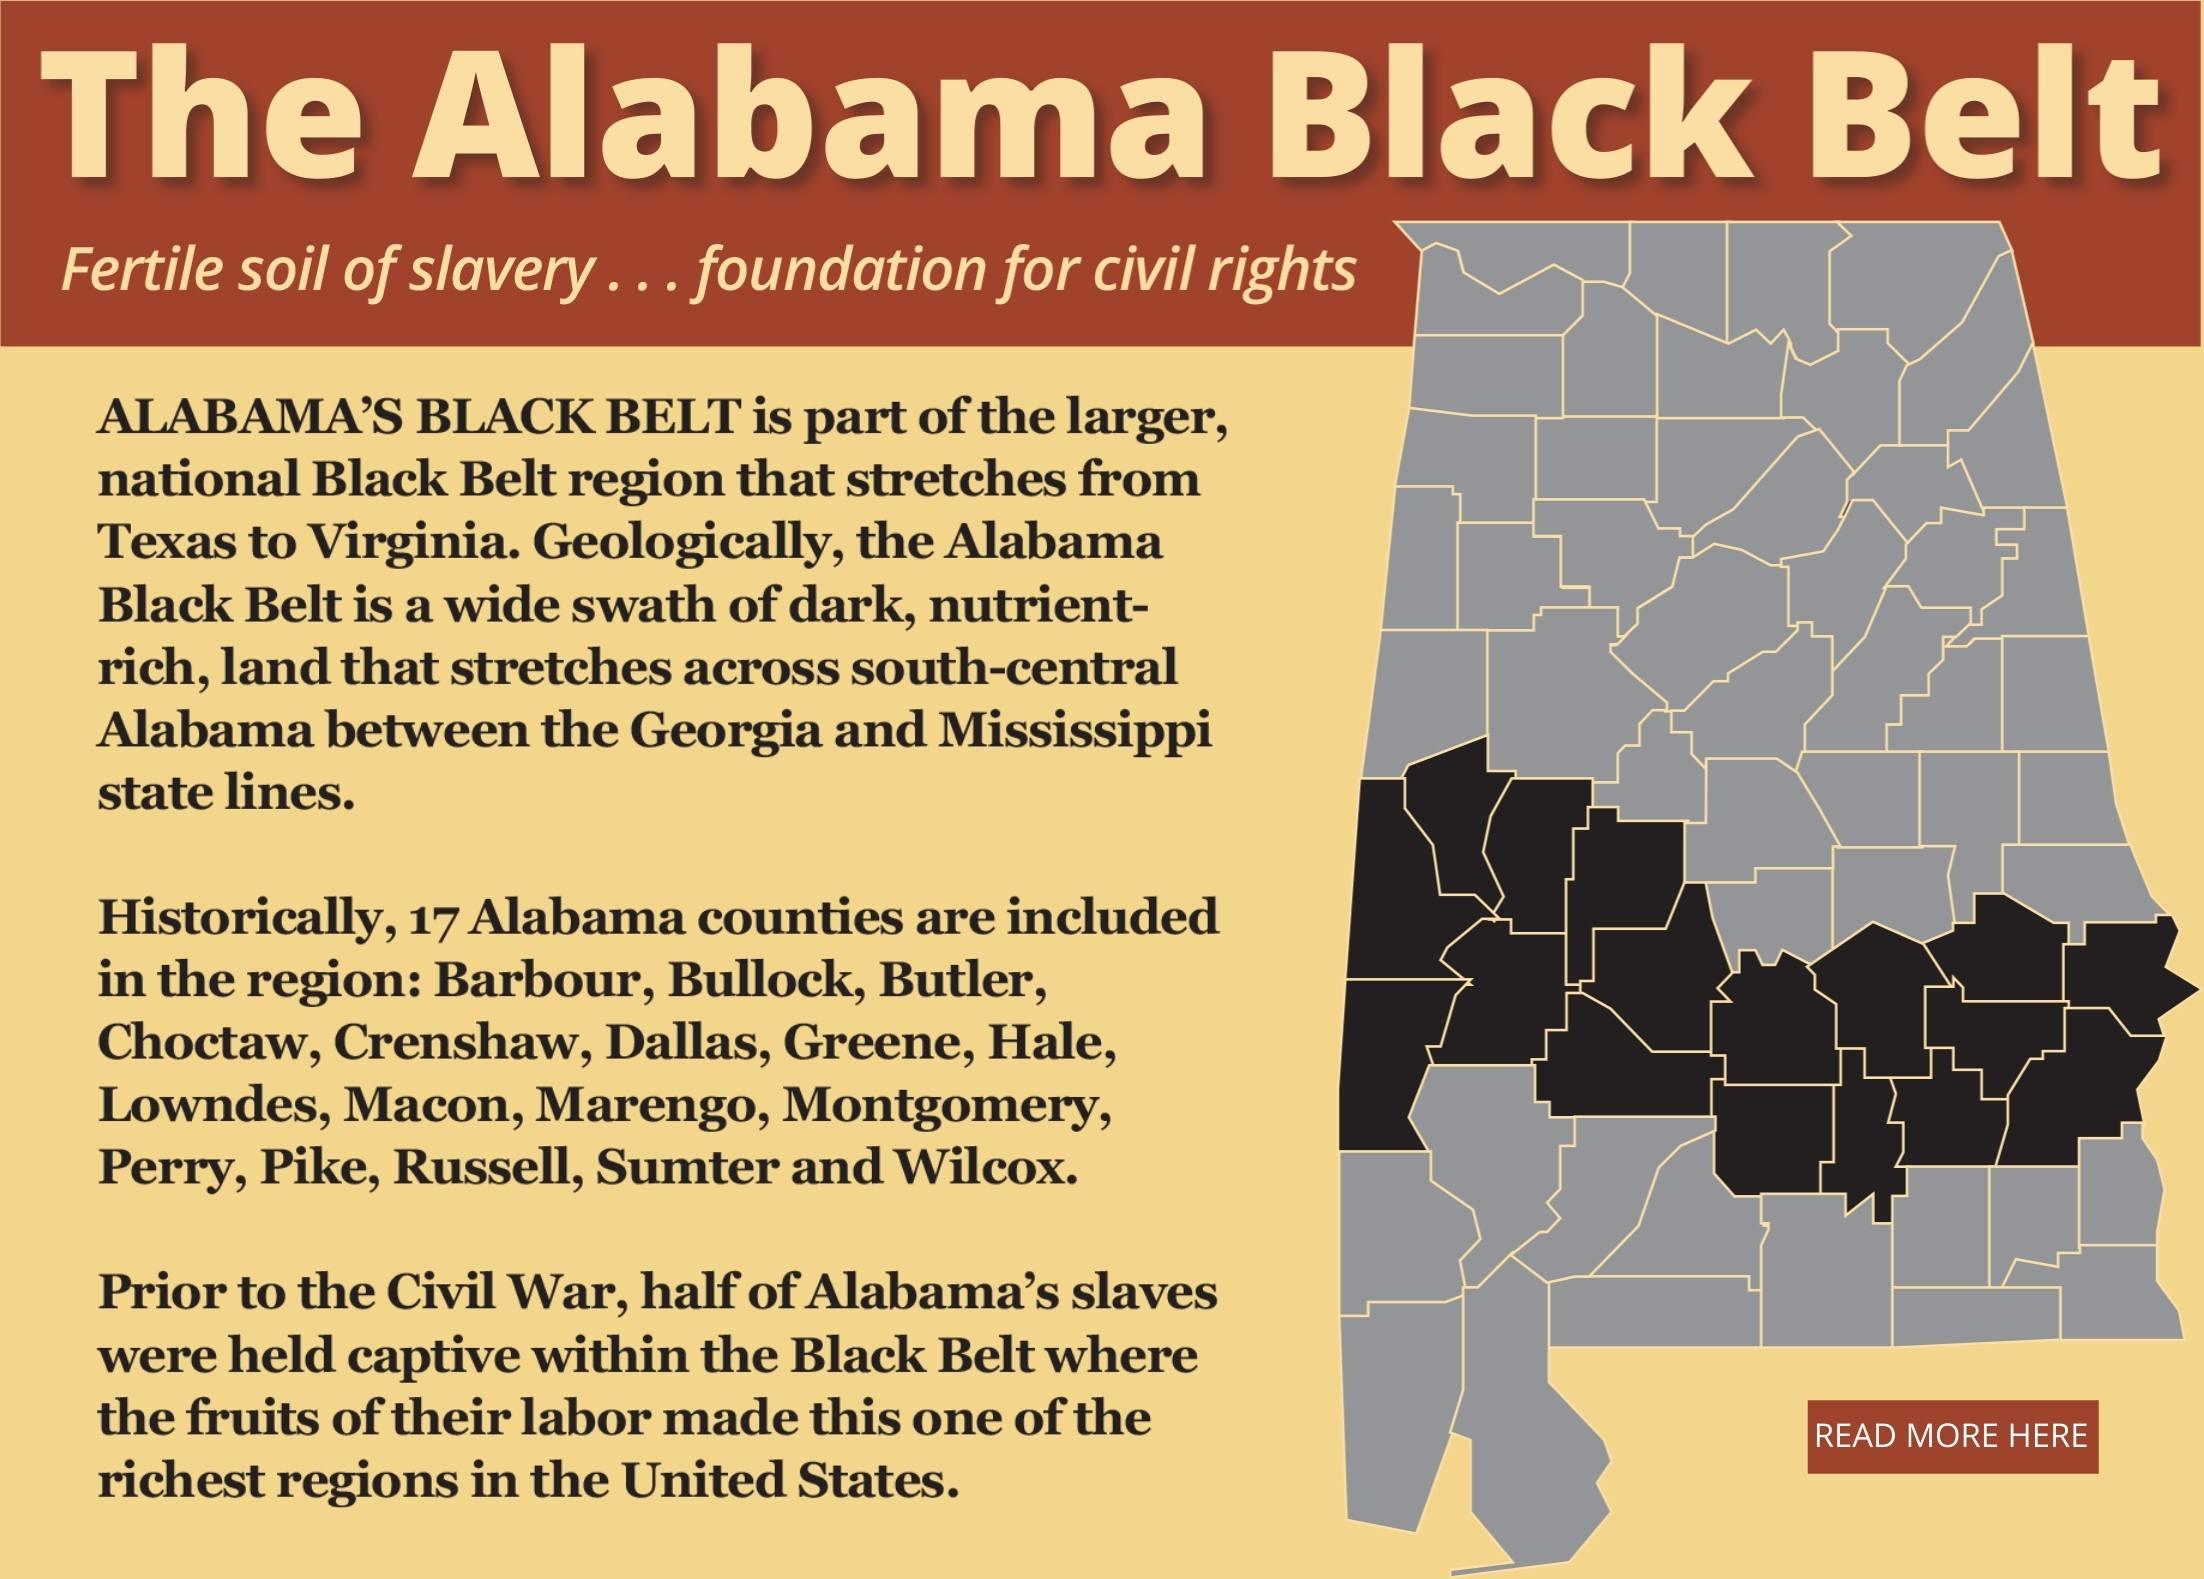 The Alabama Black Belt